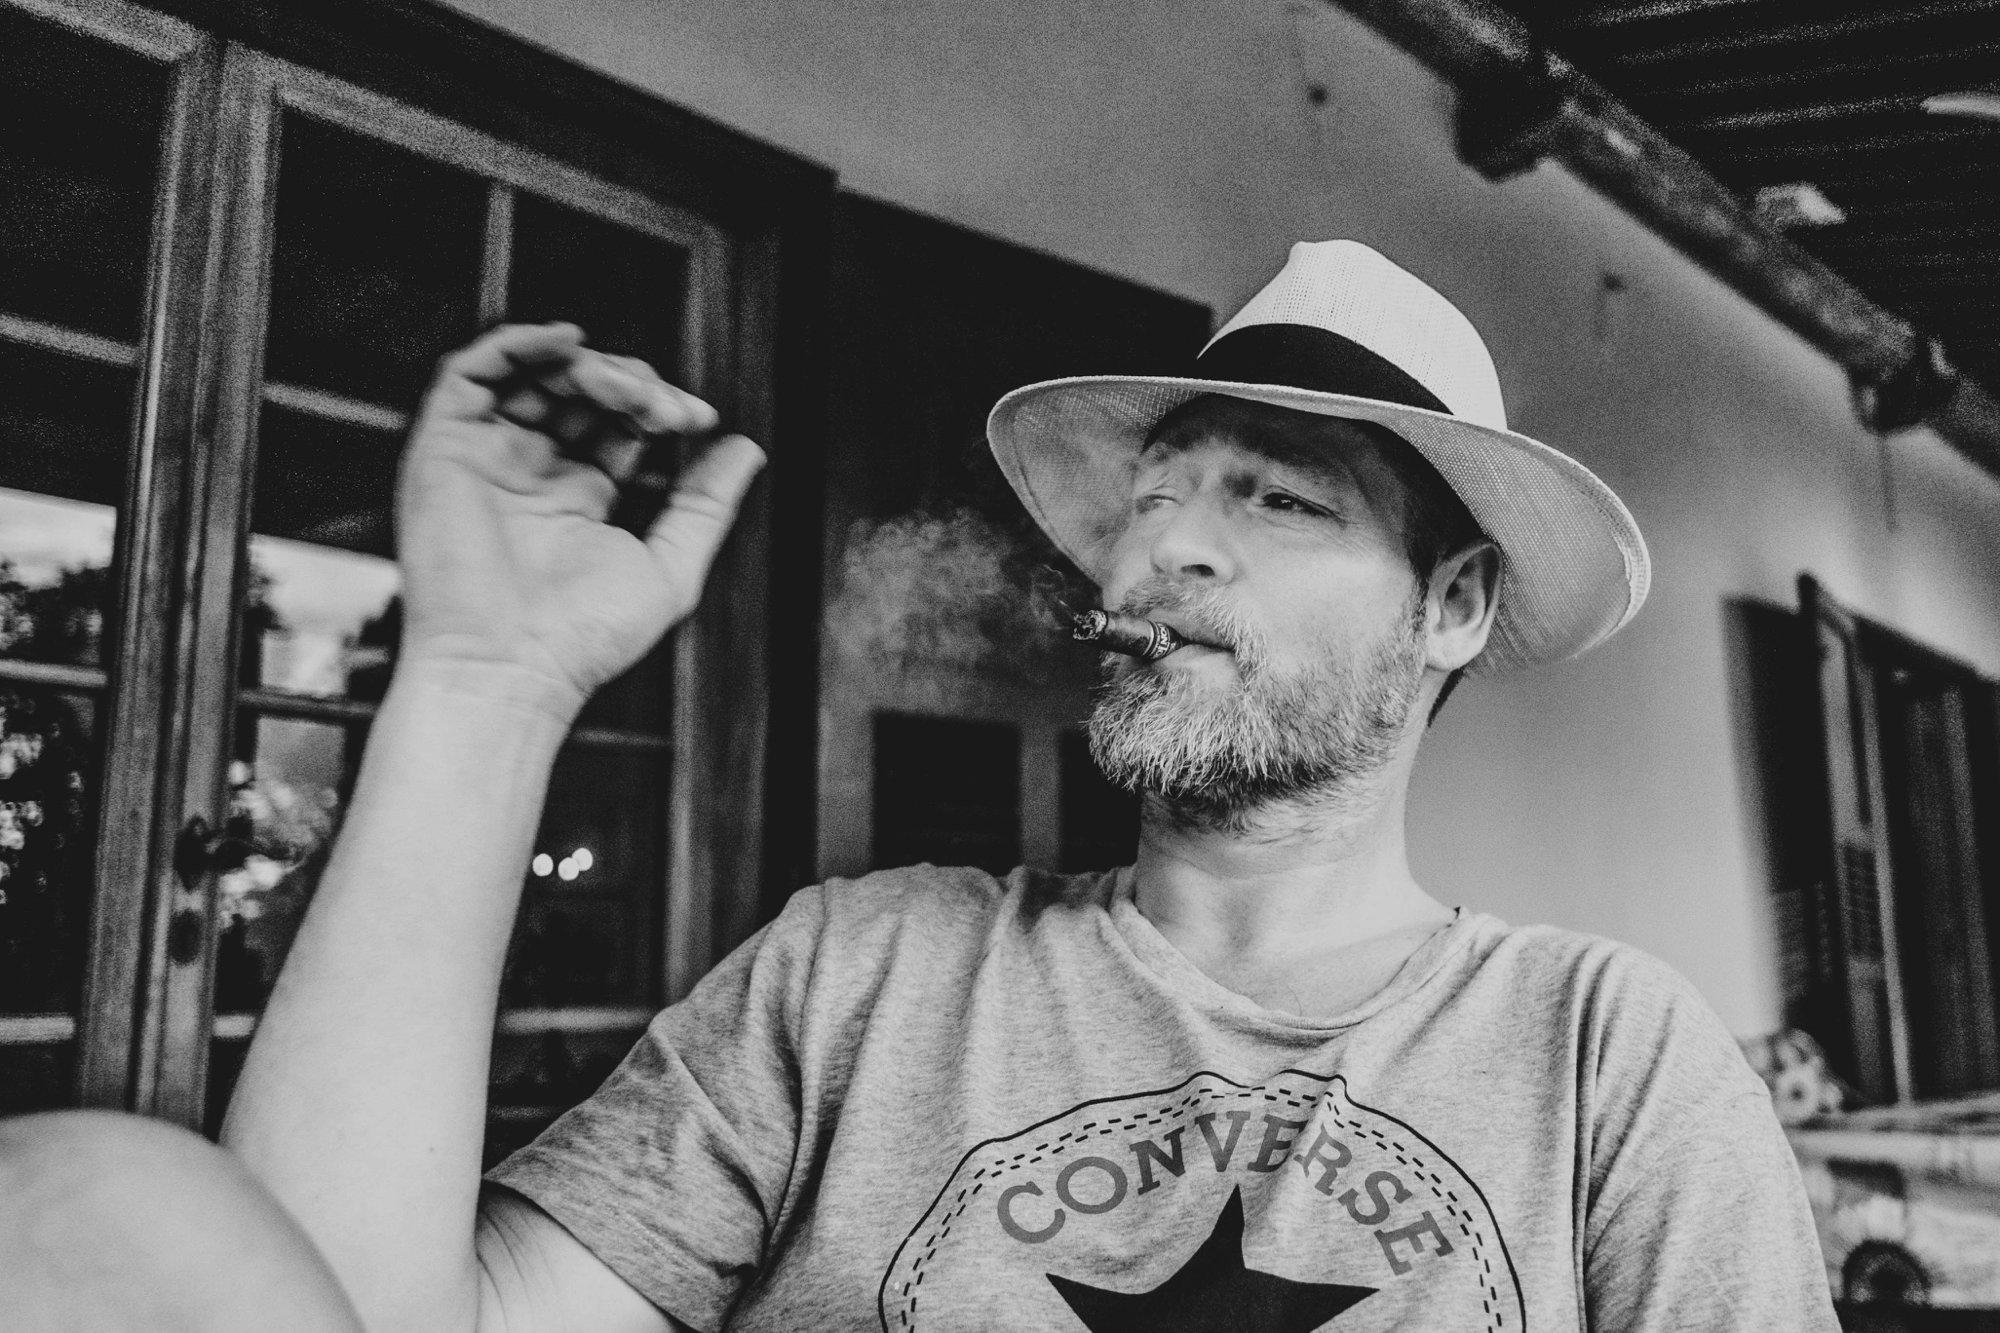 Man in hat smokes cigar Essex Documentary Travel Wedding Family Photographer